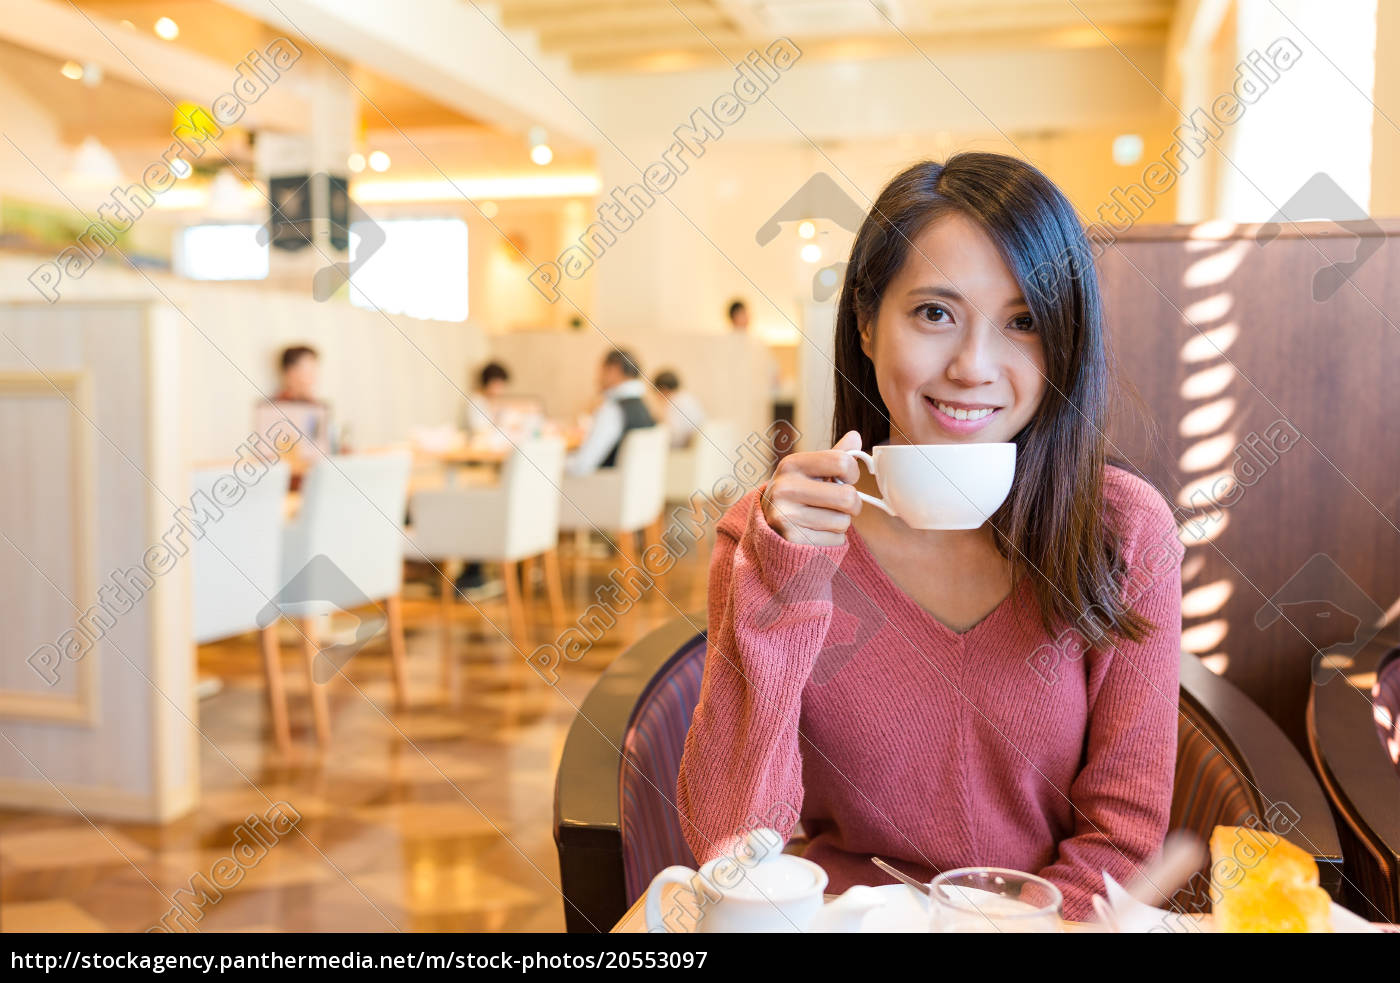 woman, enjoy, her, drink, in, coffee - 20553097